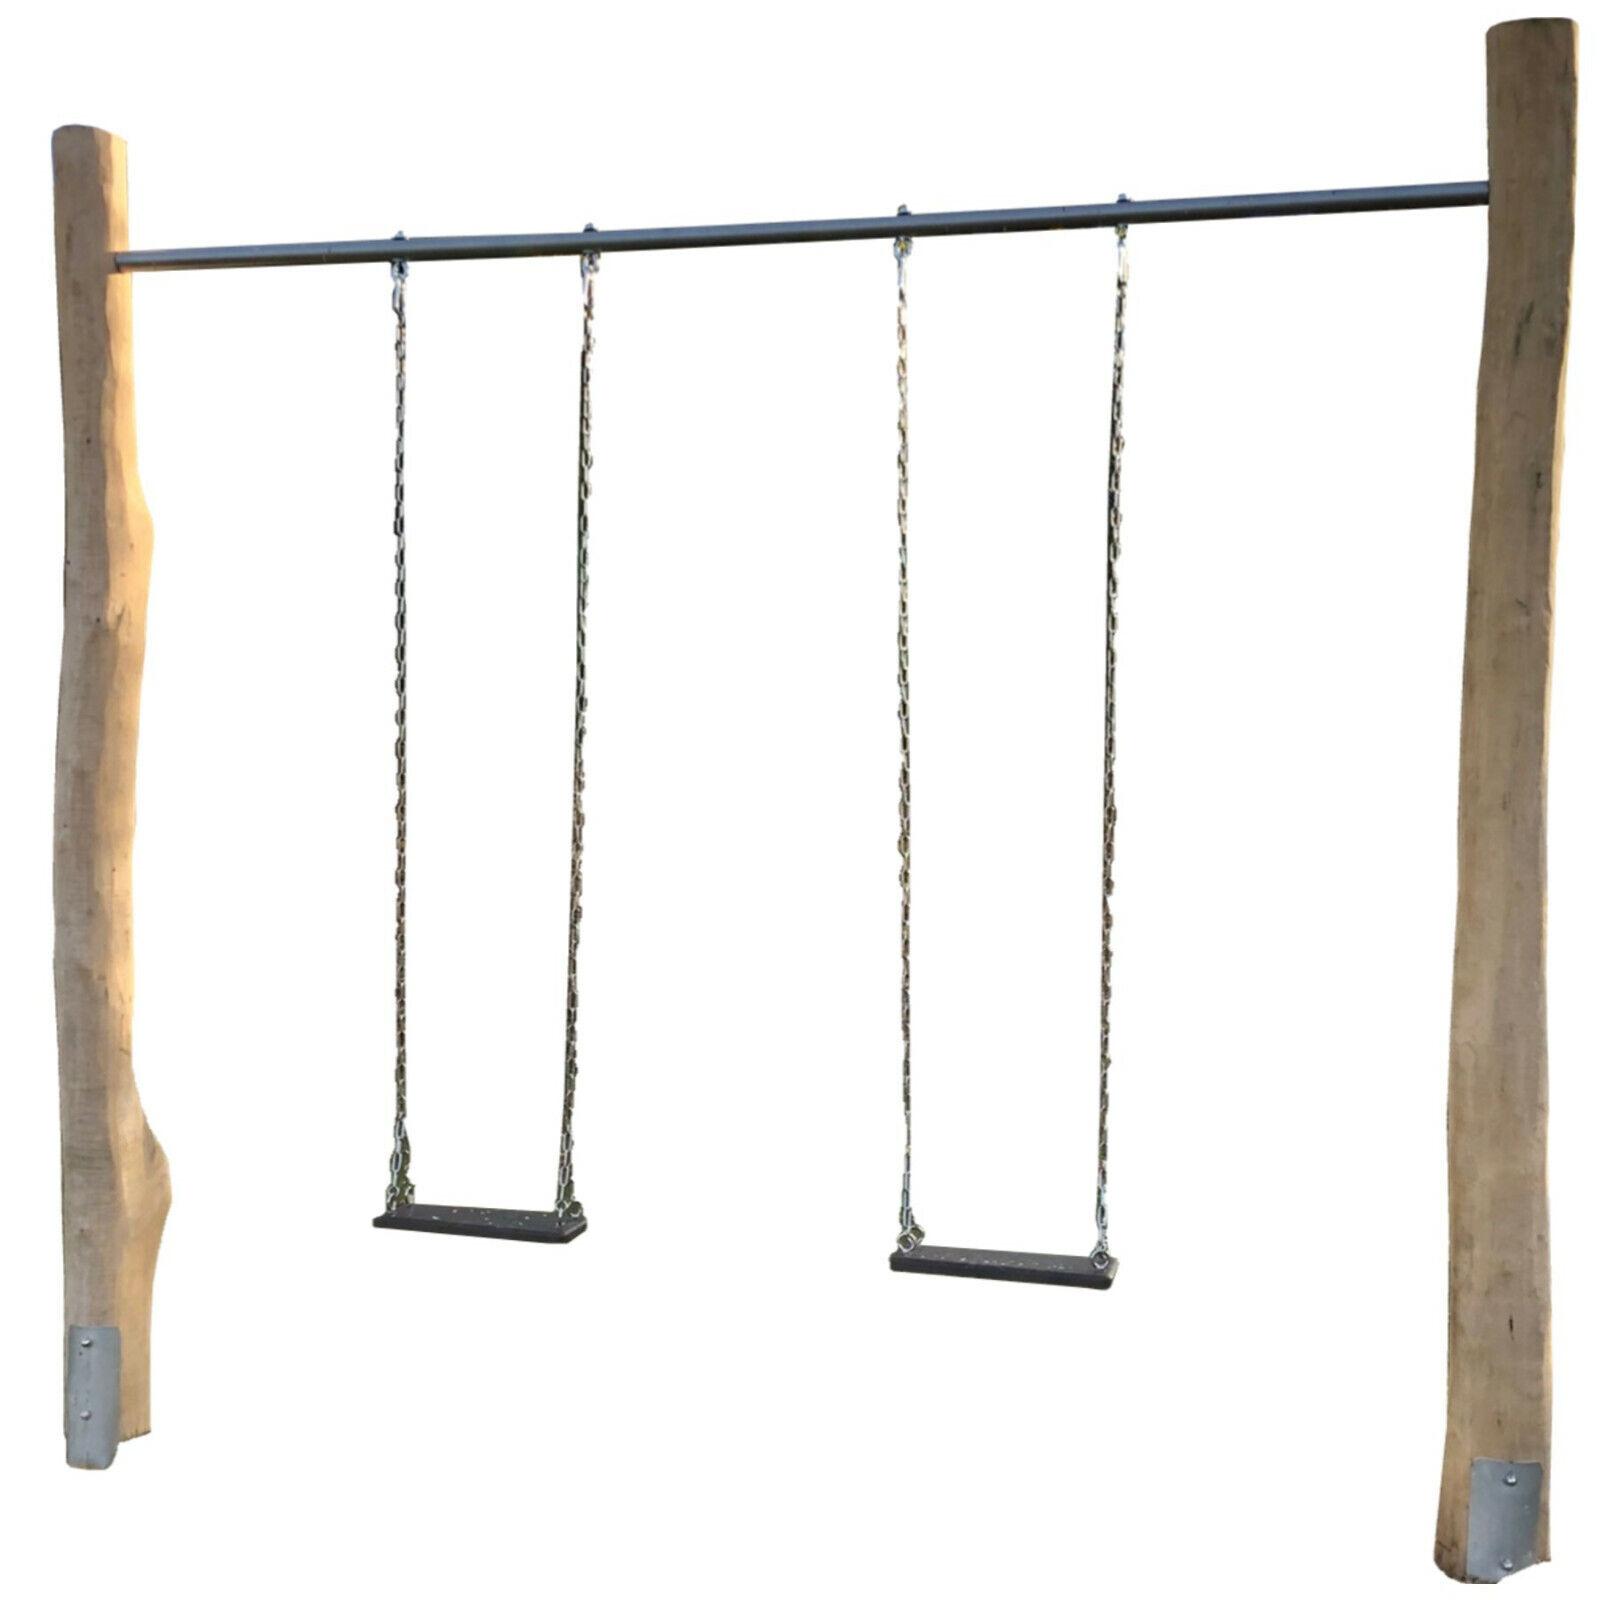 Schaukelstange Stahlrohrfür Doppelschaukel Kinderschaukel Schaukelgestell Kopf